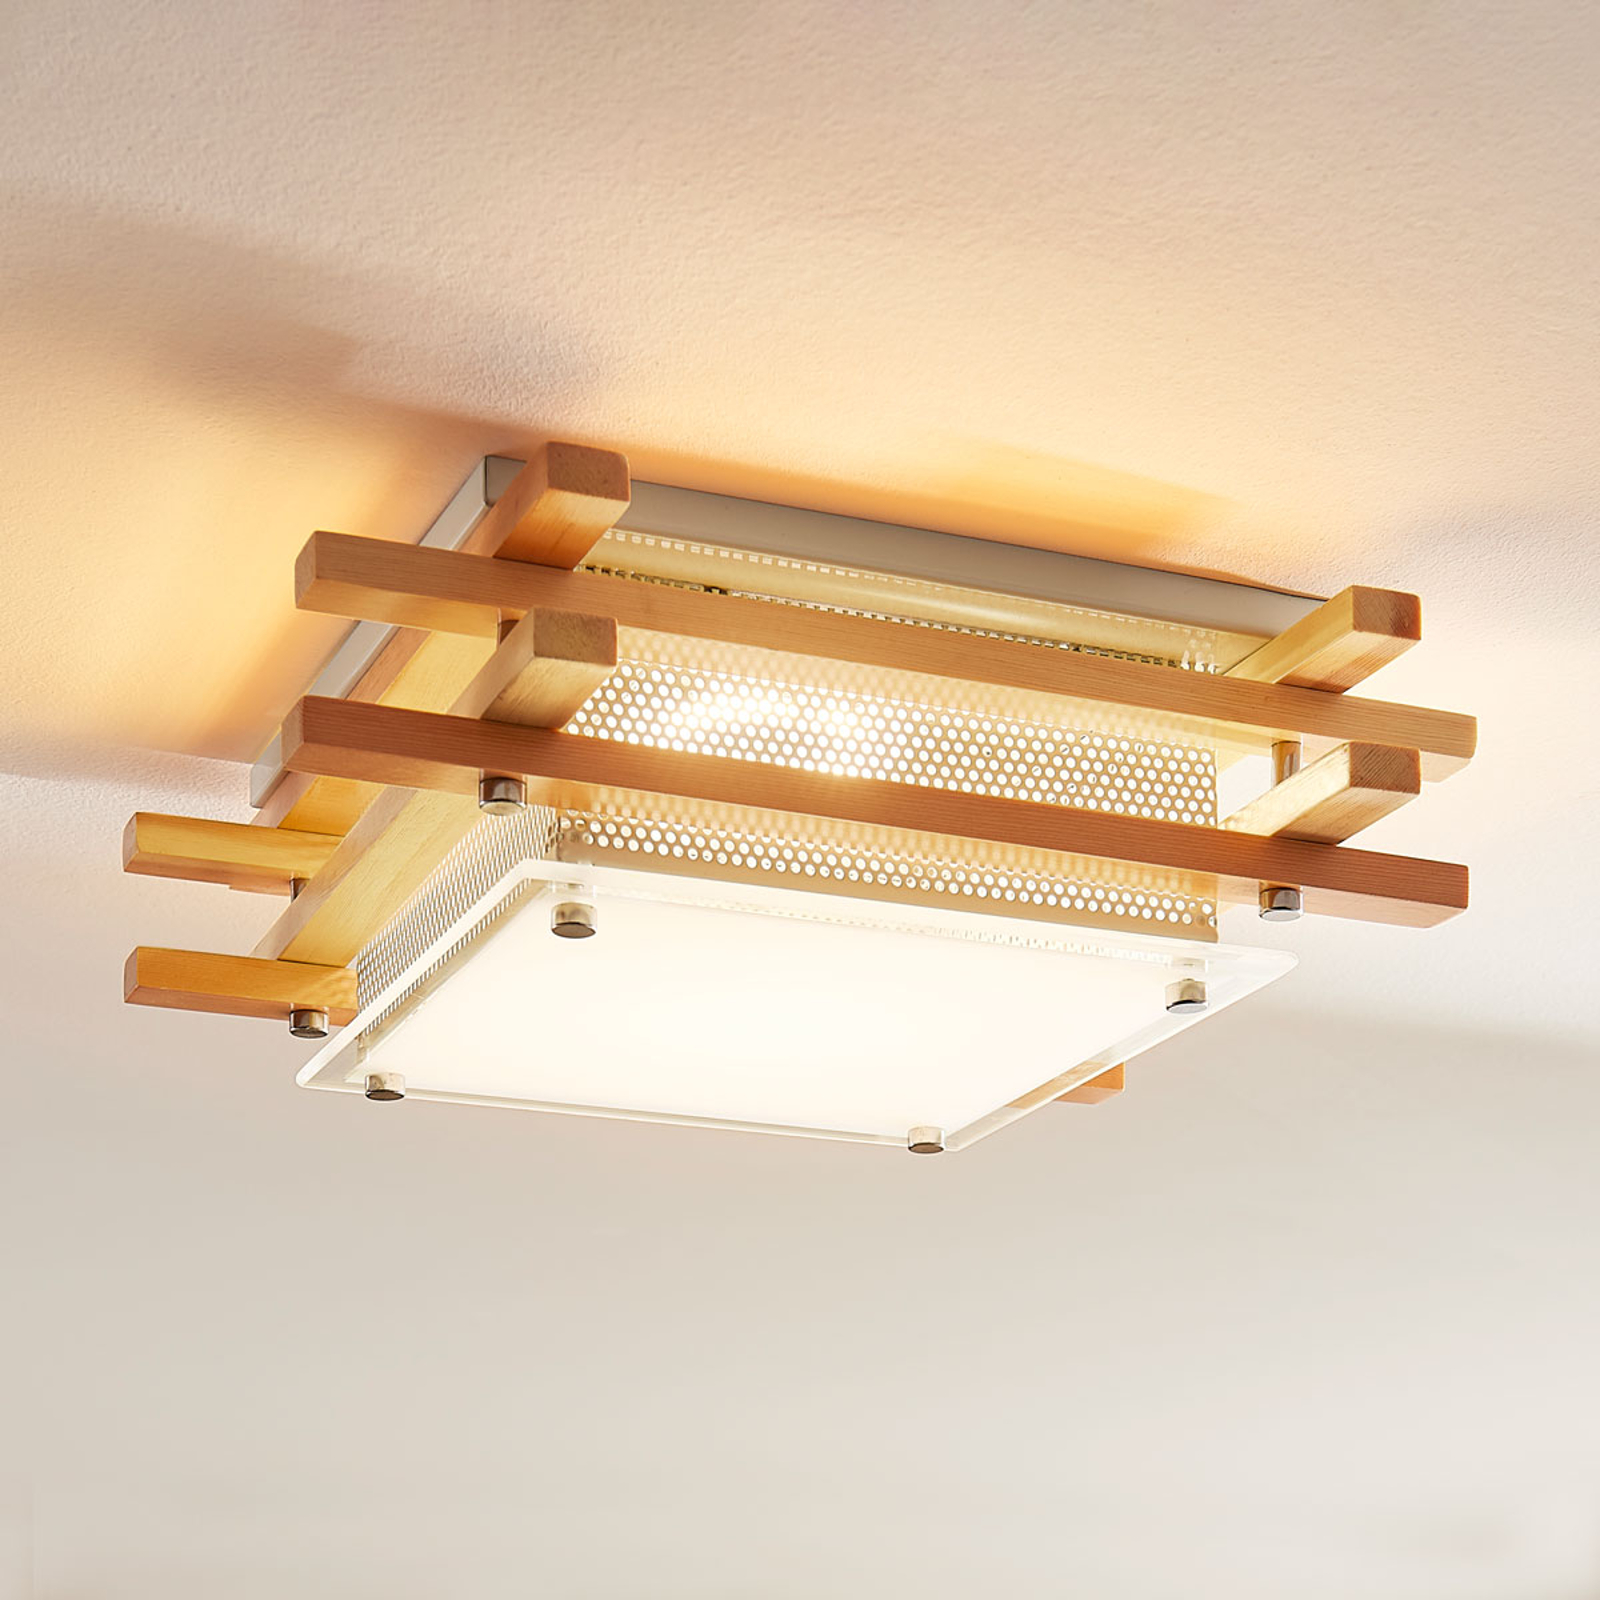 Firkantet LED-taklampe Zuna i tre, dimbar